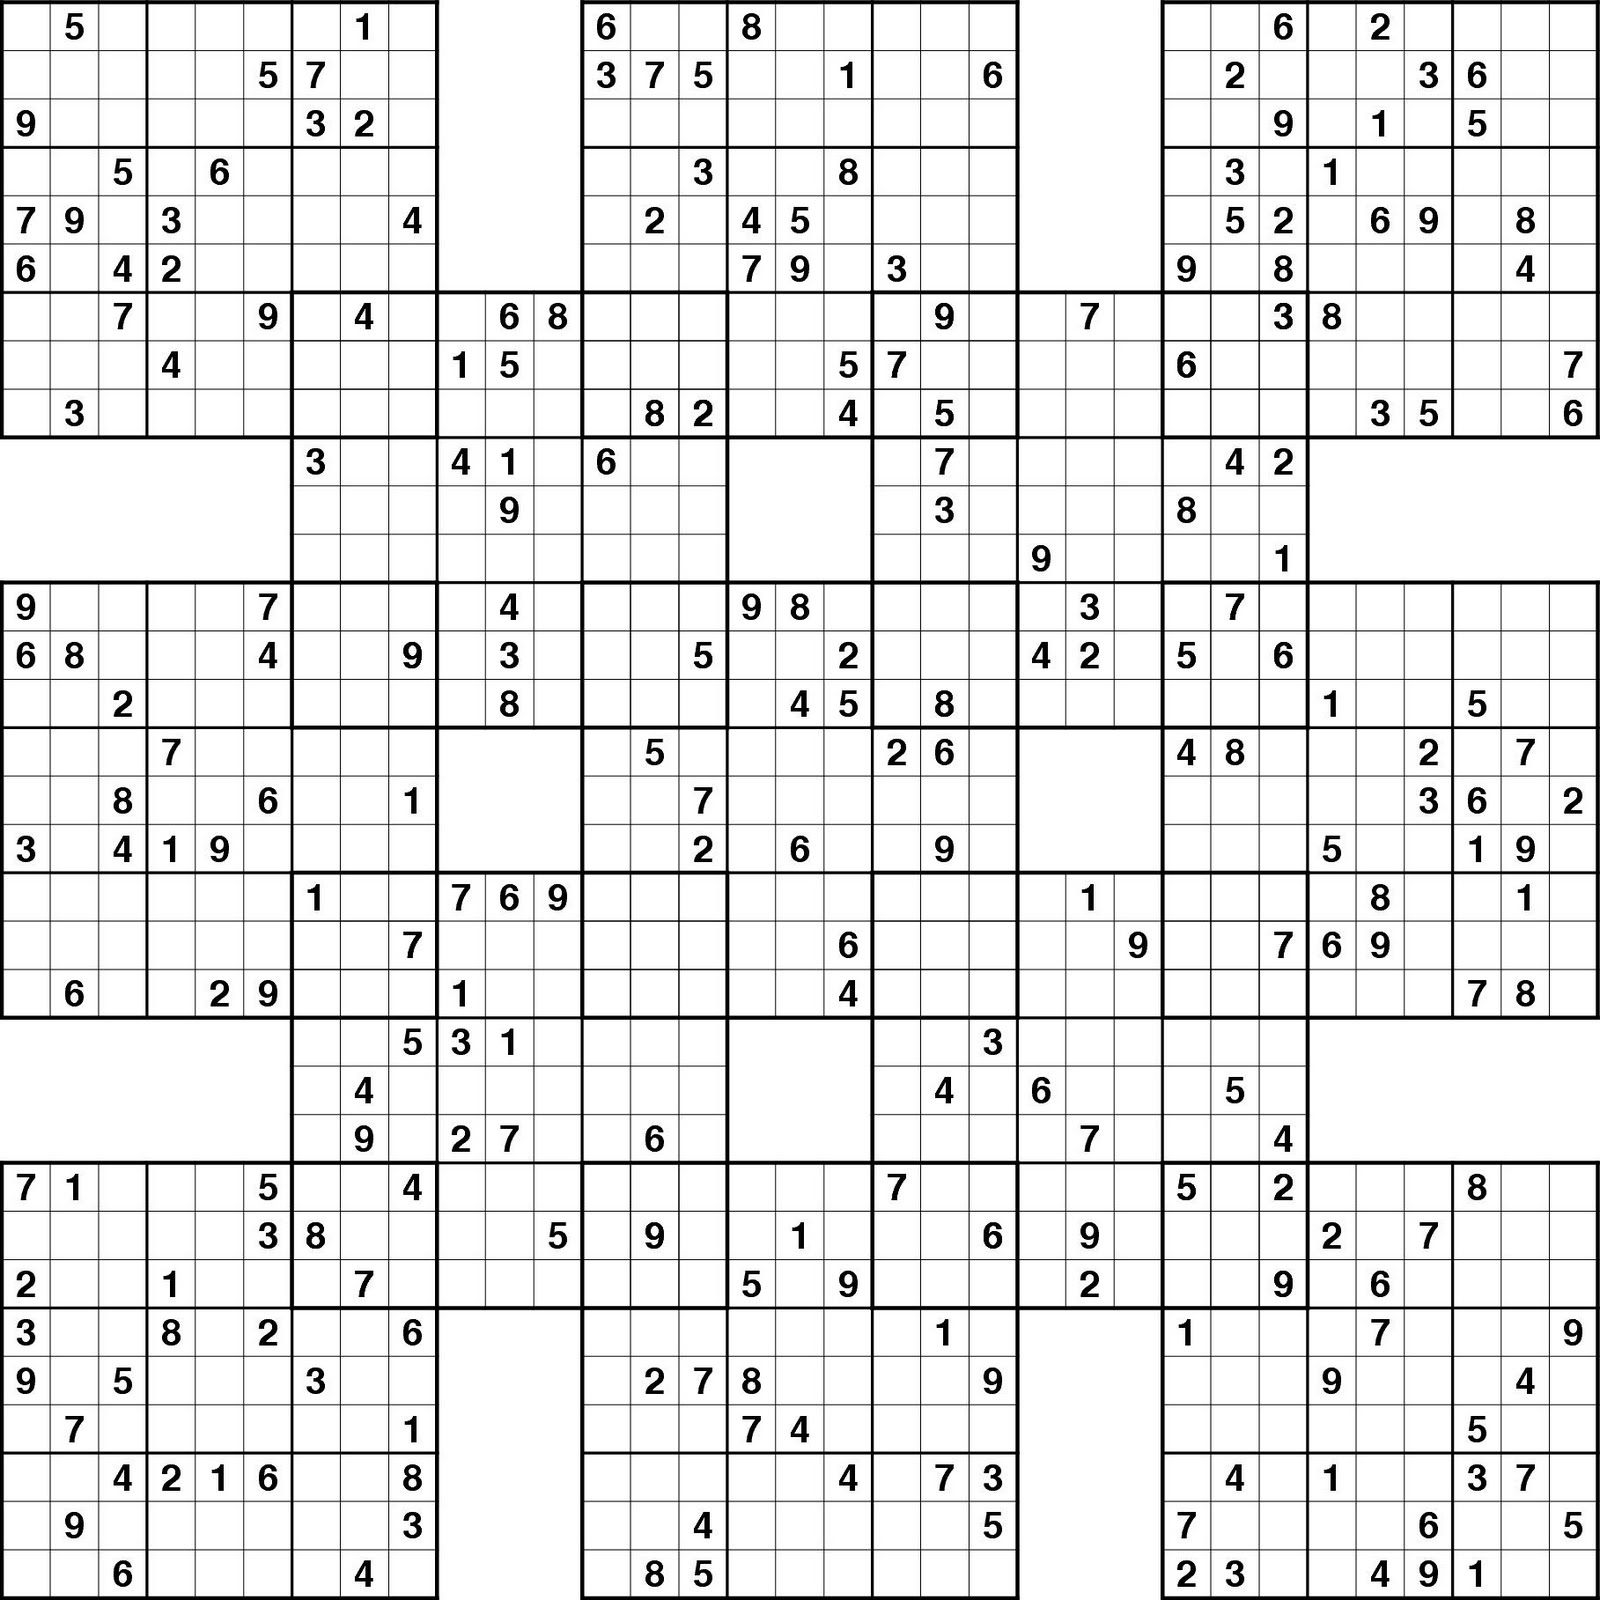 photo relating to Free Printable Samurai Sudoku Puzzles known as printable sudoku game titles